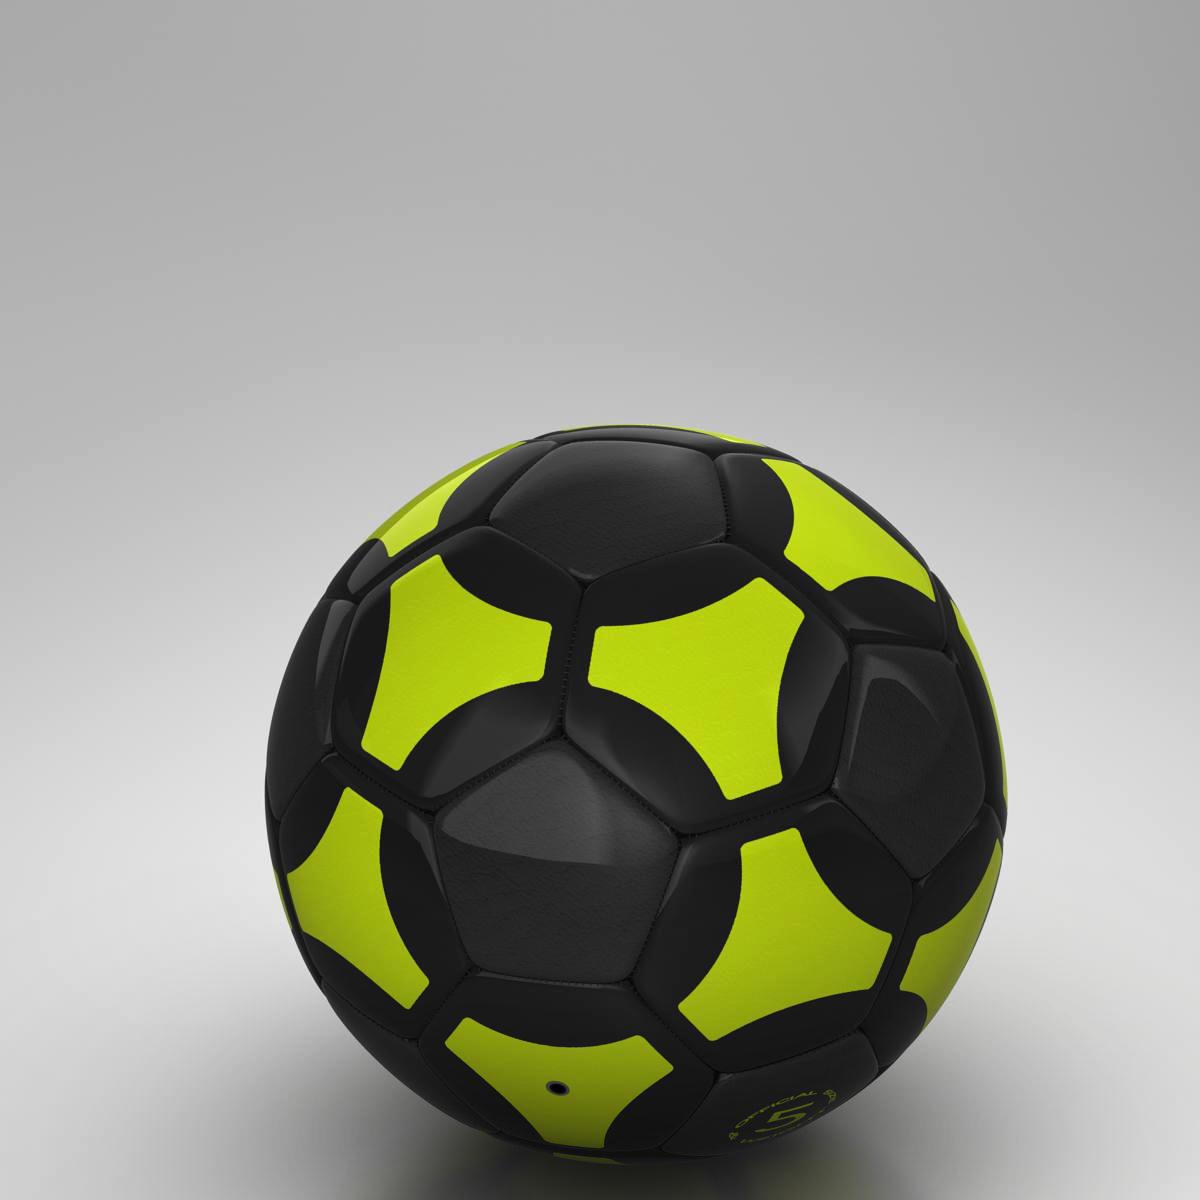 soccerball хар шар 3d загвар 3ds max fbx c4d ma mb obj 204212